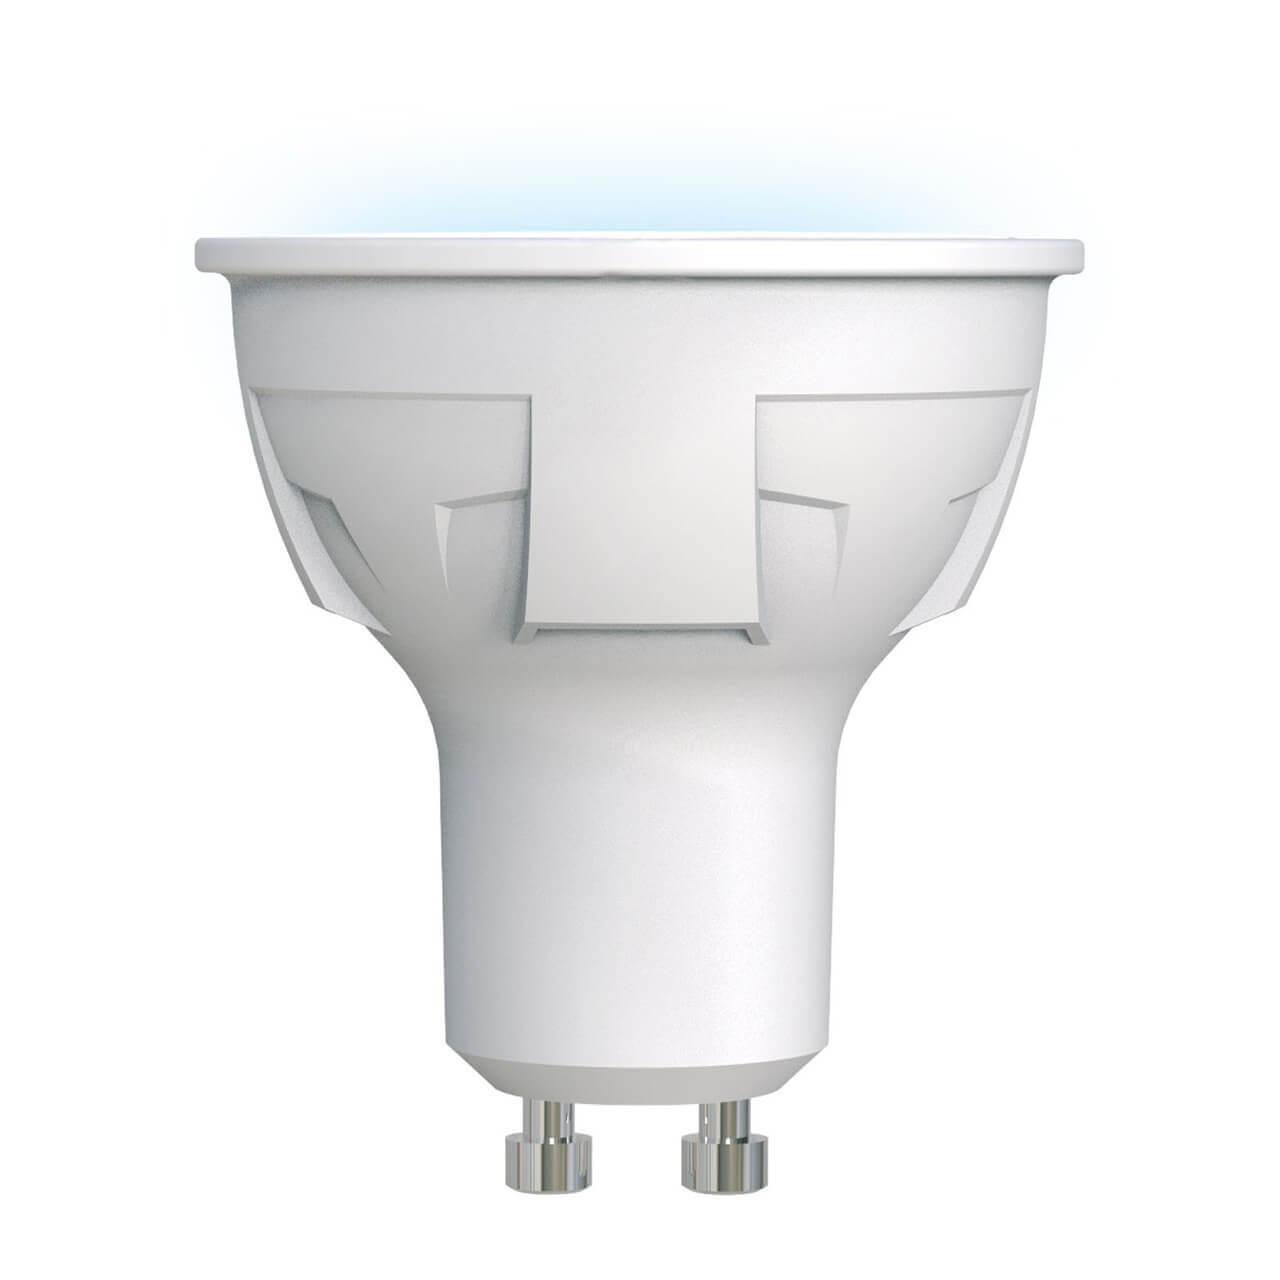 Лампа светодиодная (UL-00002421) Uniel GU10 6W 4000K матовая LED-JCDR 6W/NW/GU10/FR PLP01WH